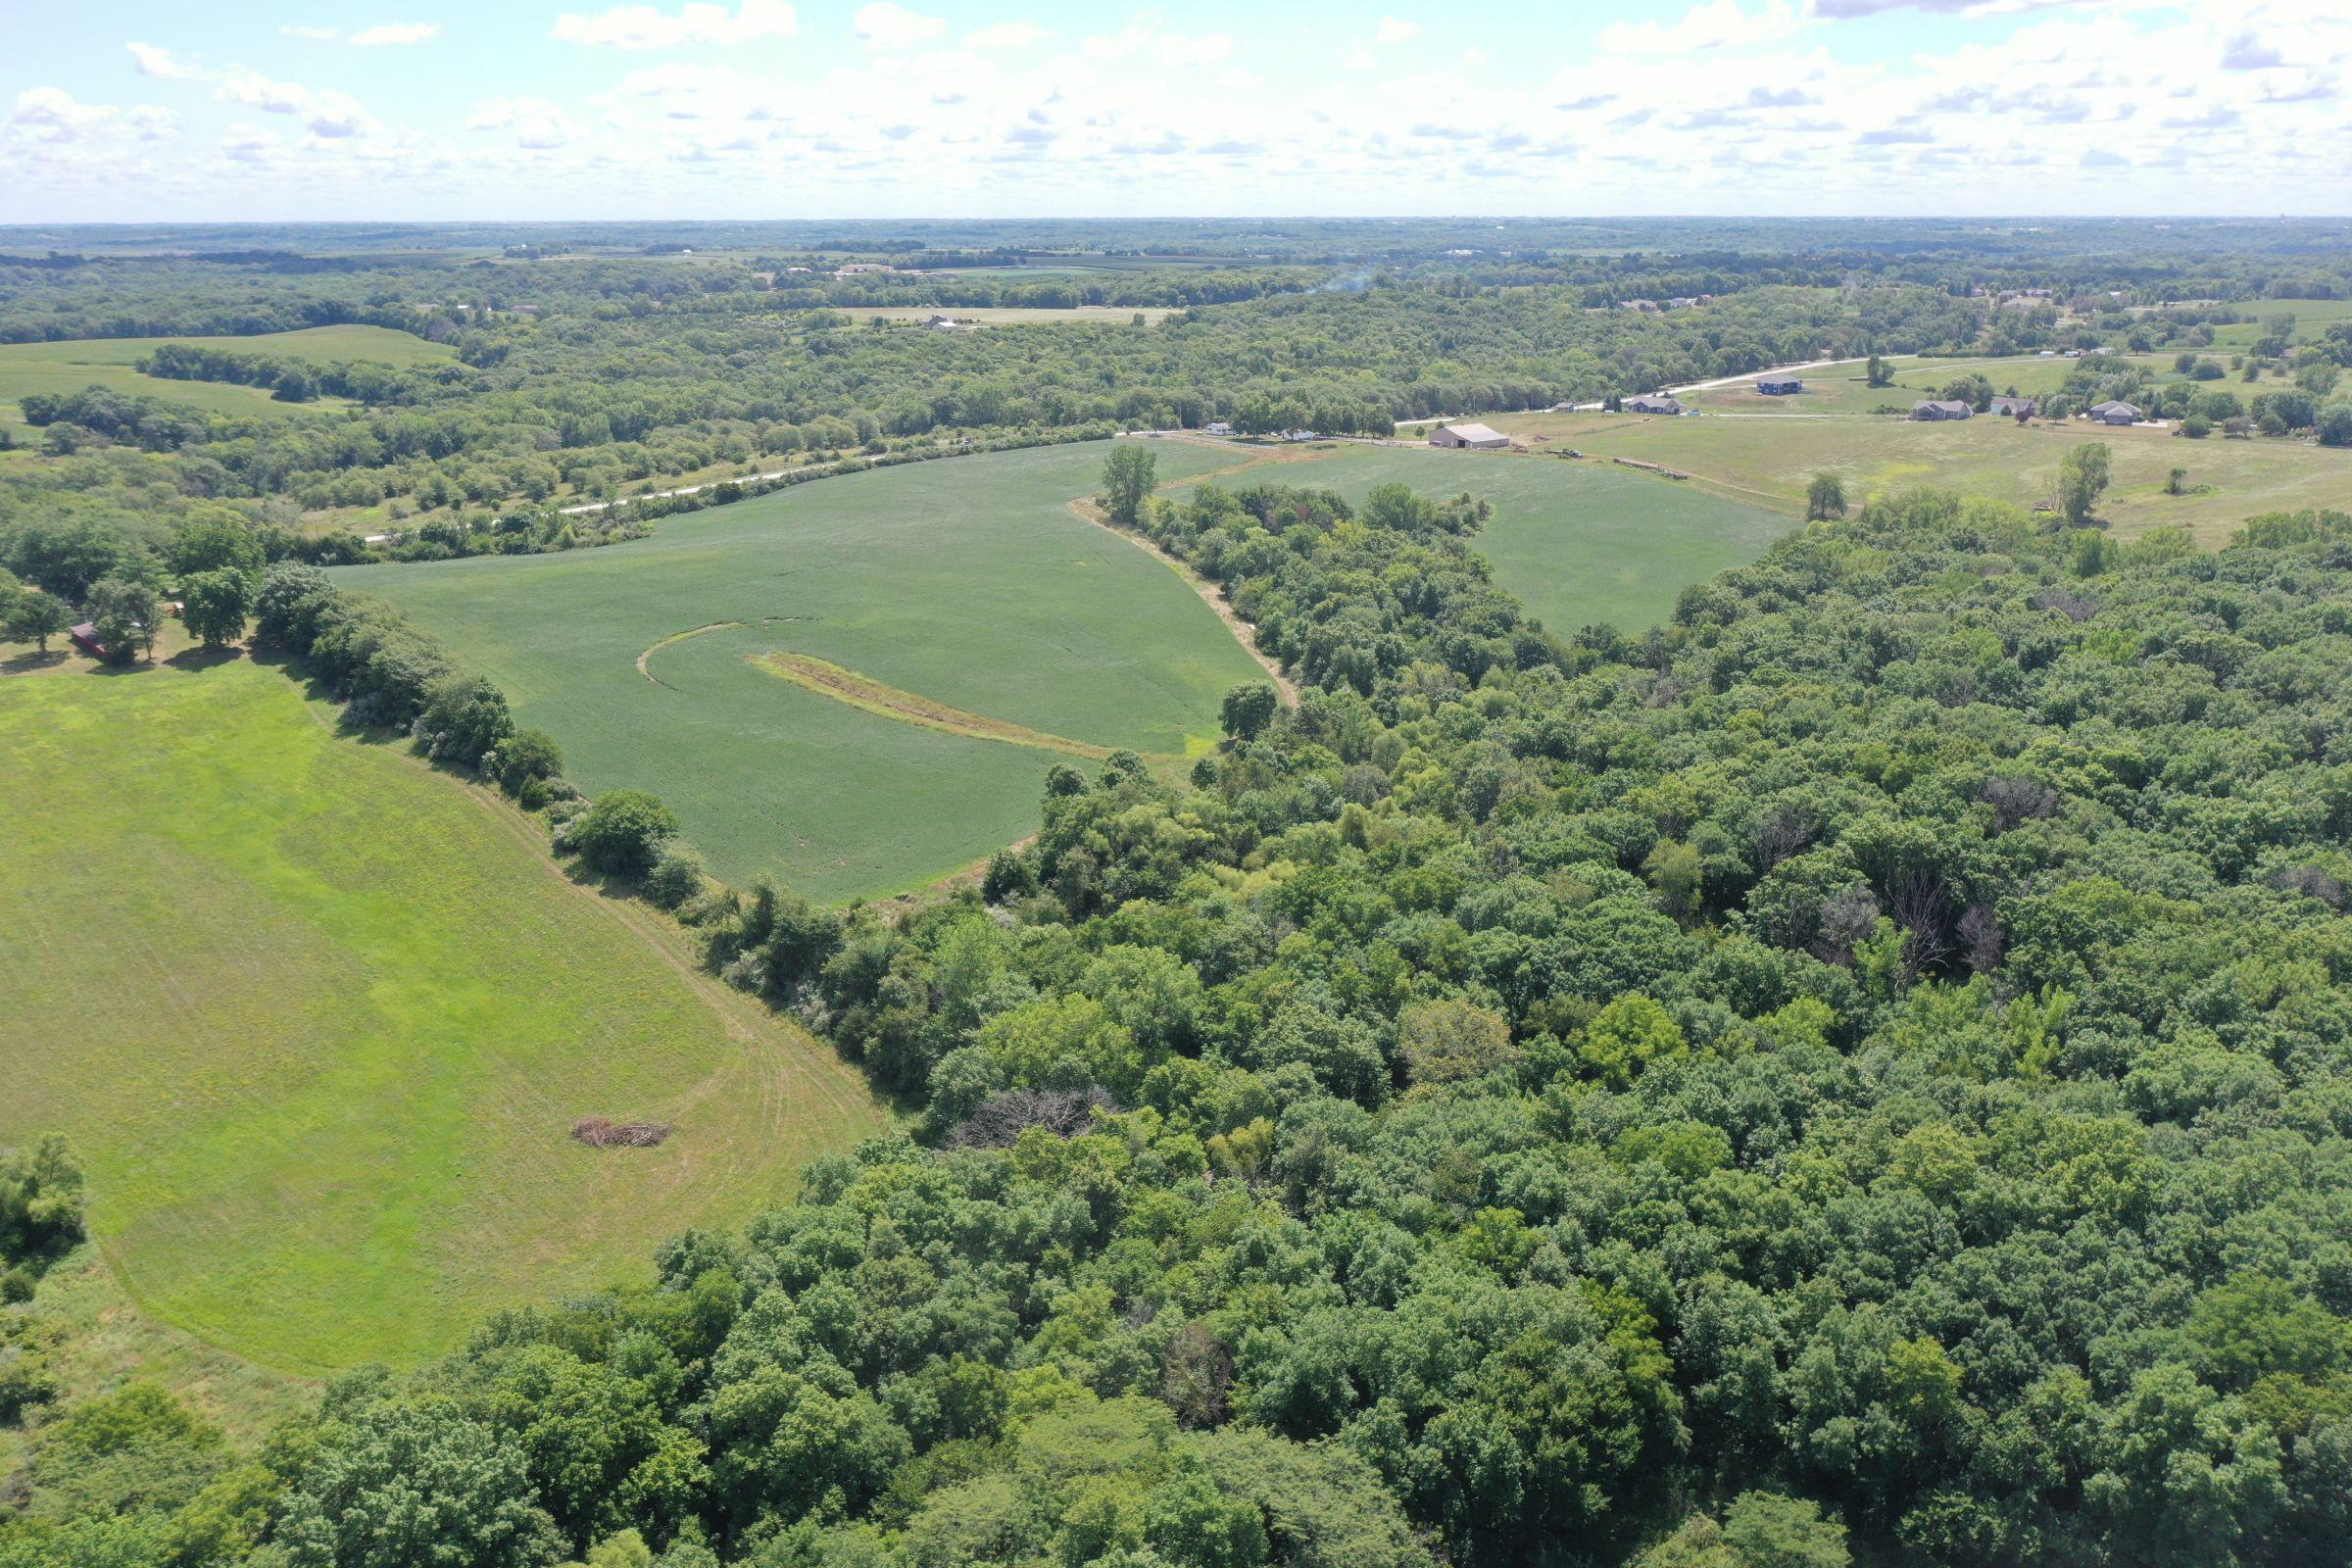 development-land-warren-county-iowa-38-acres-listing-number-15513-0-2021-05-06-172540.JPG